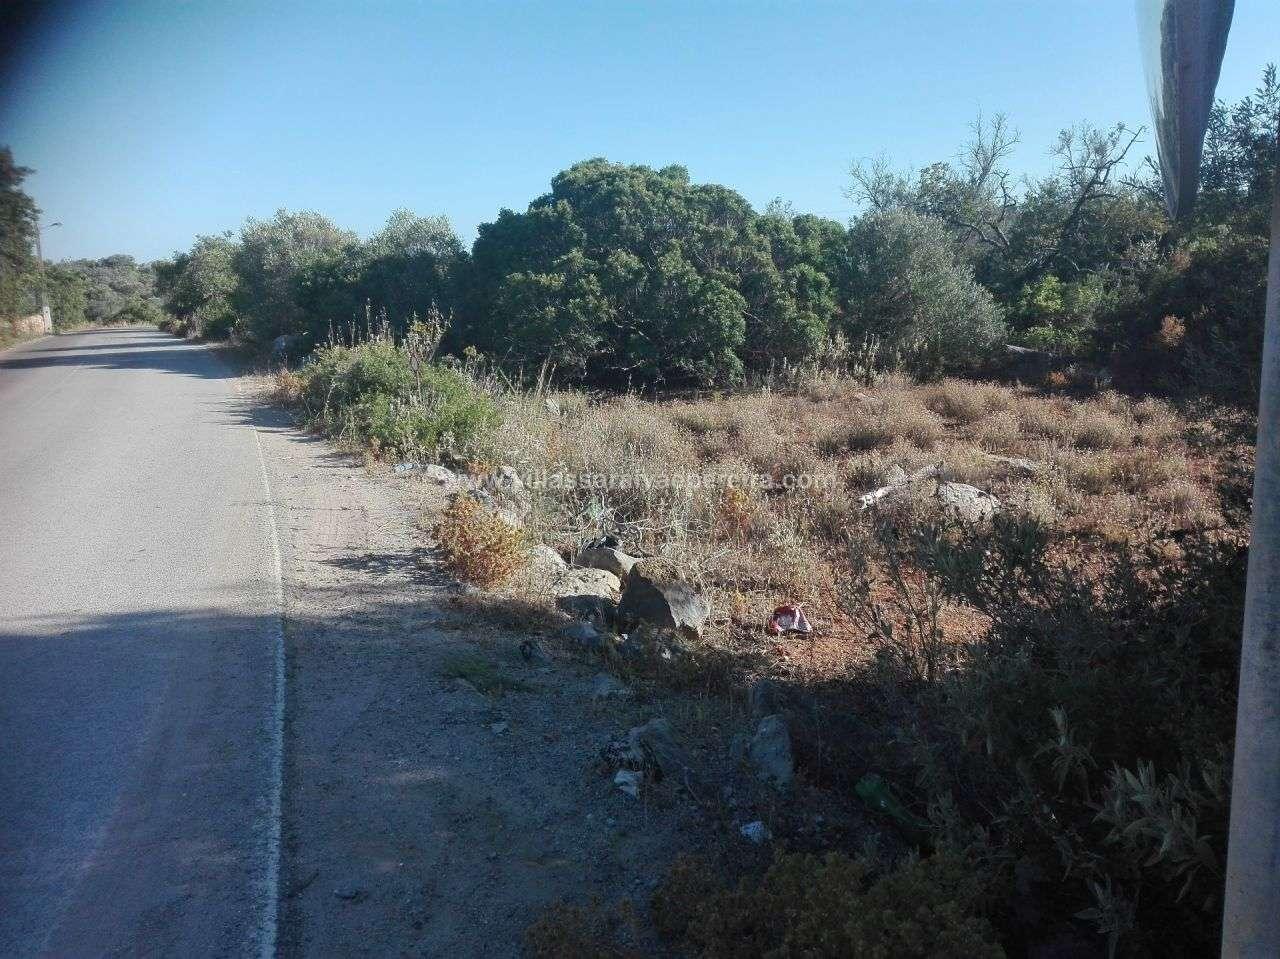 Terreno para comprar, Moncarapacho e Fuseta, Olhão, Faro - Foto 3